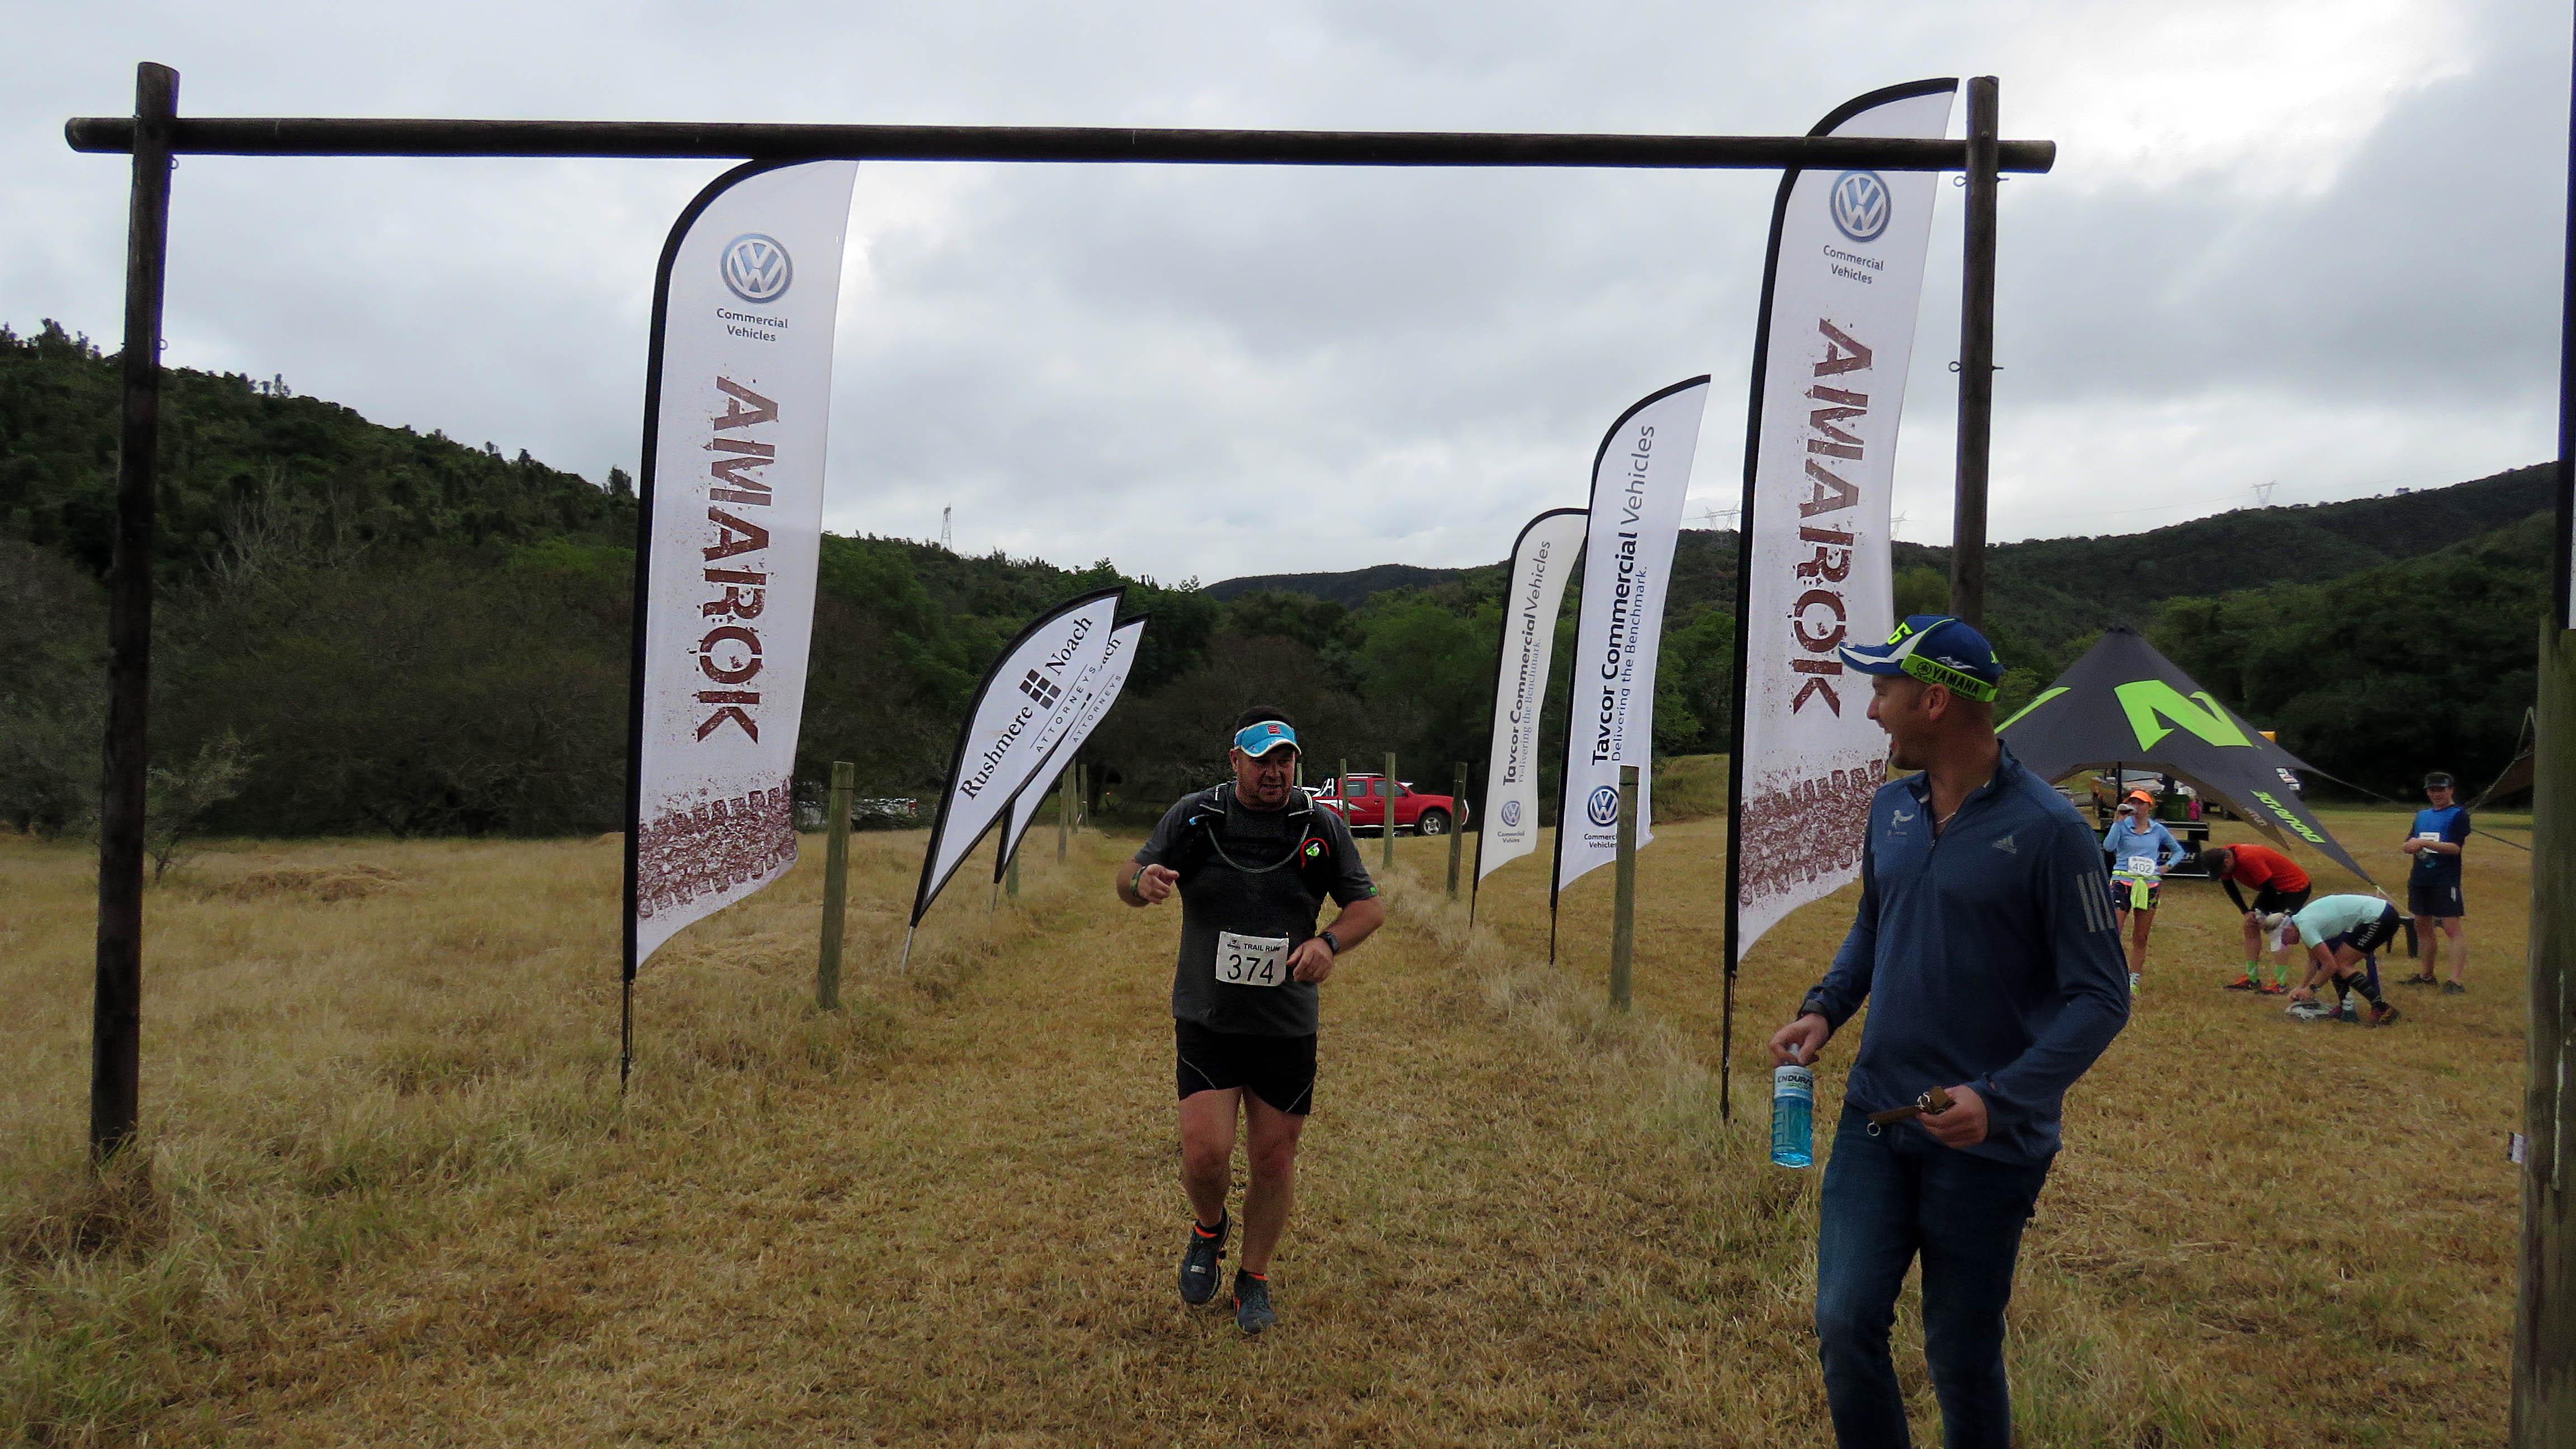 hayterdale trailrun 2018-08-05  (104)